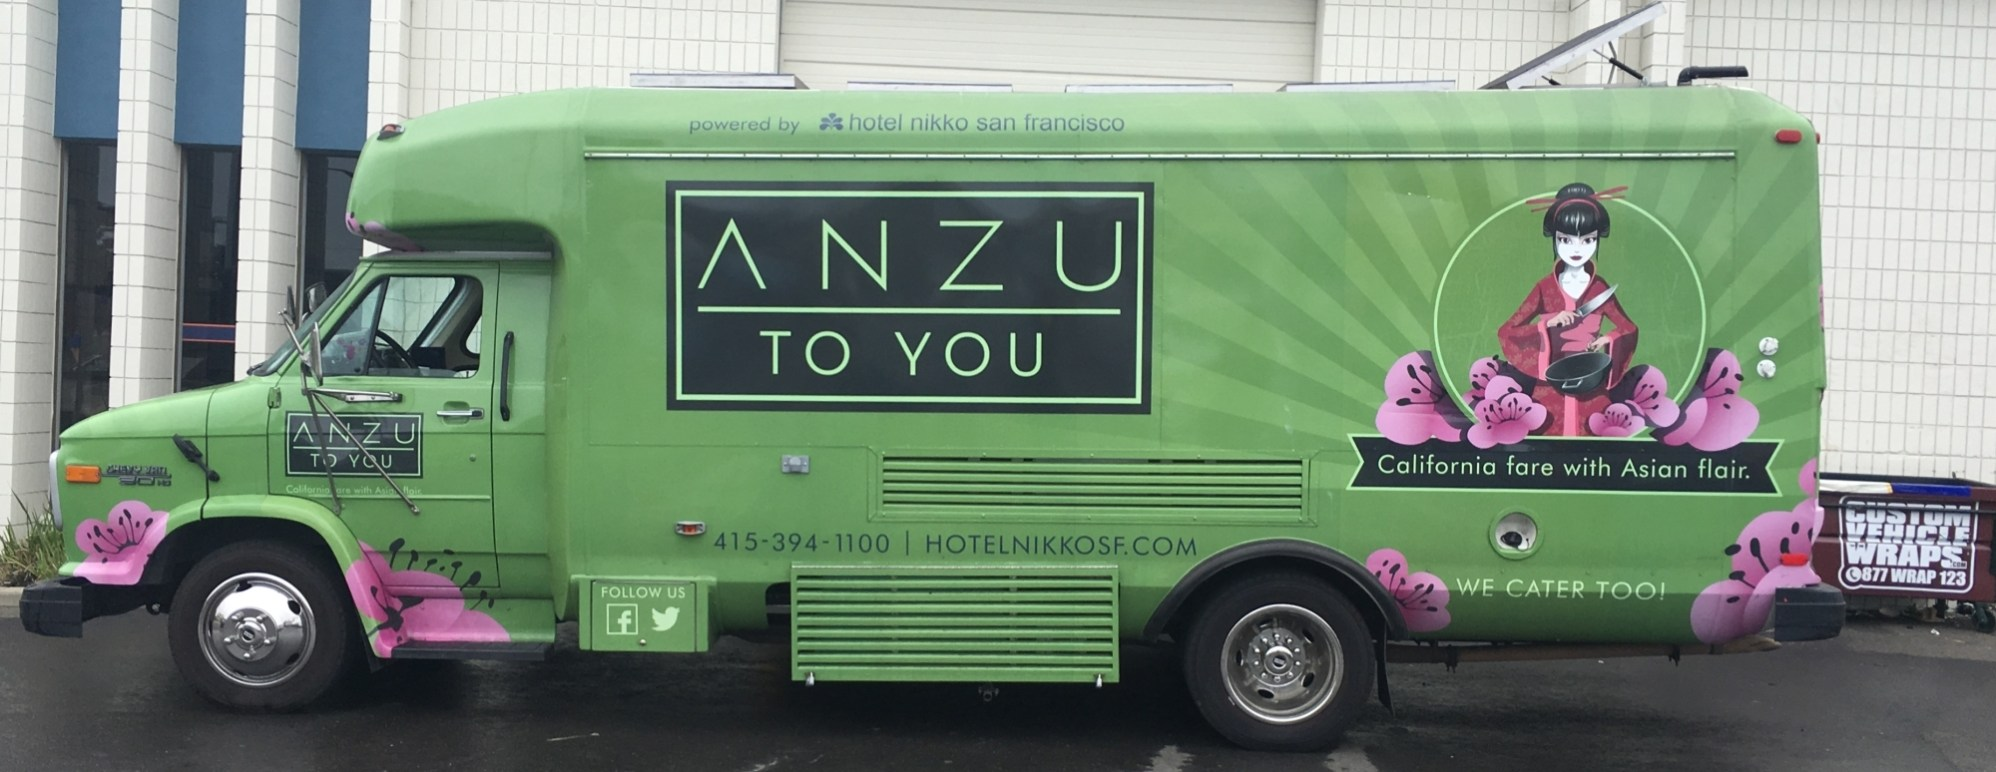 nikko sf anzu food truck wrap-04